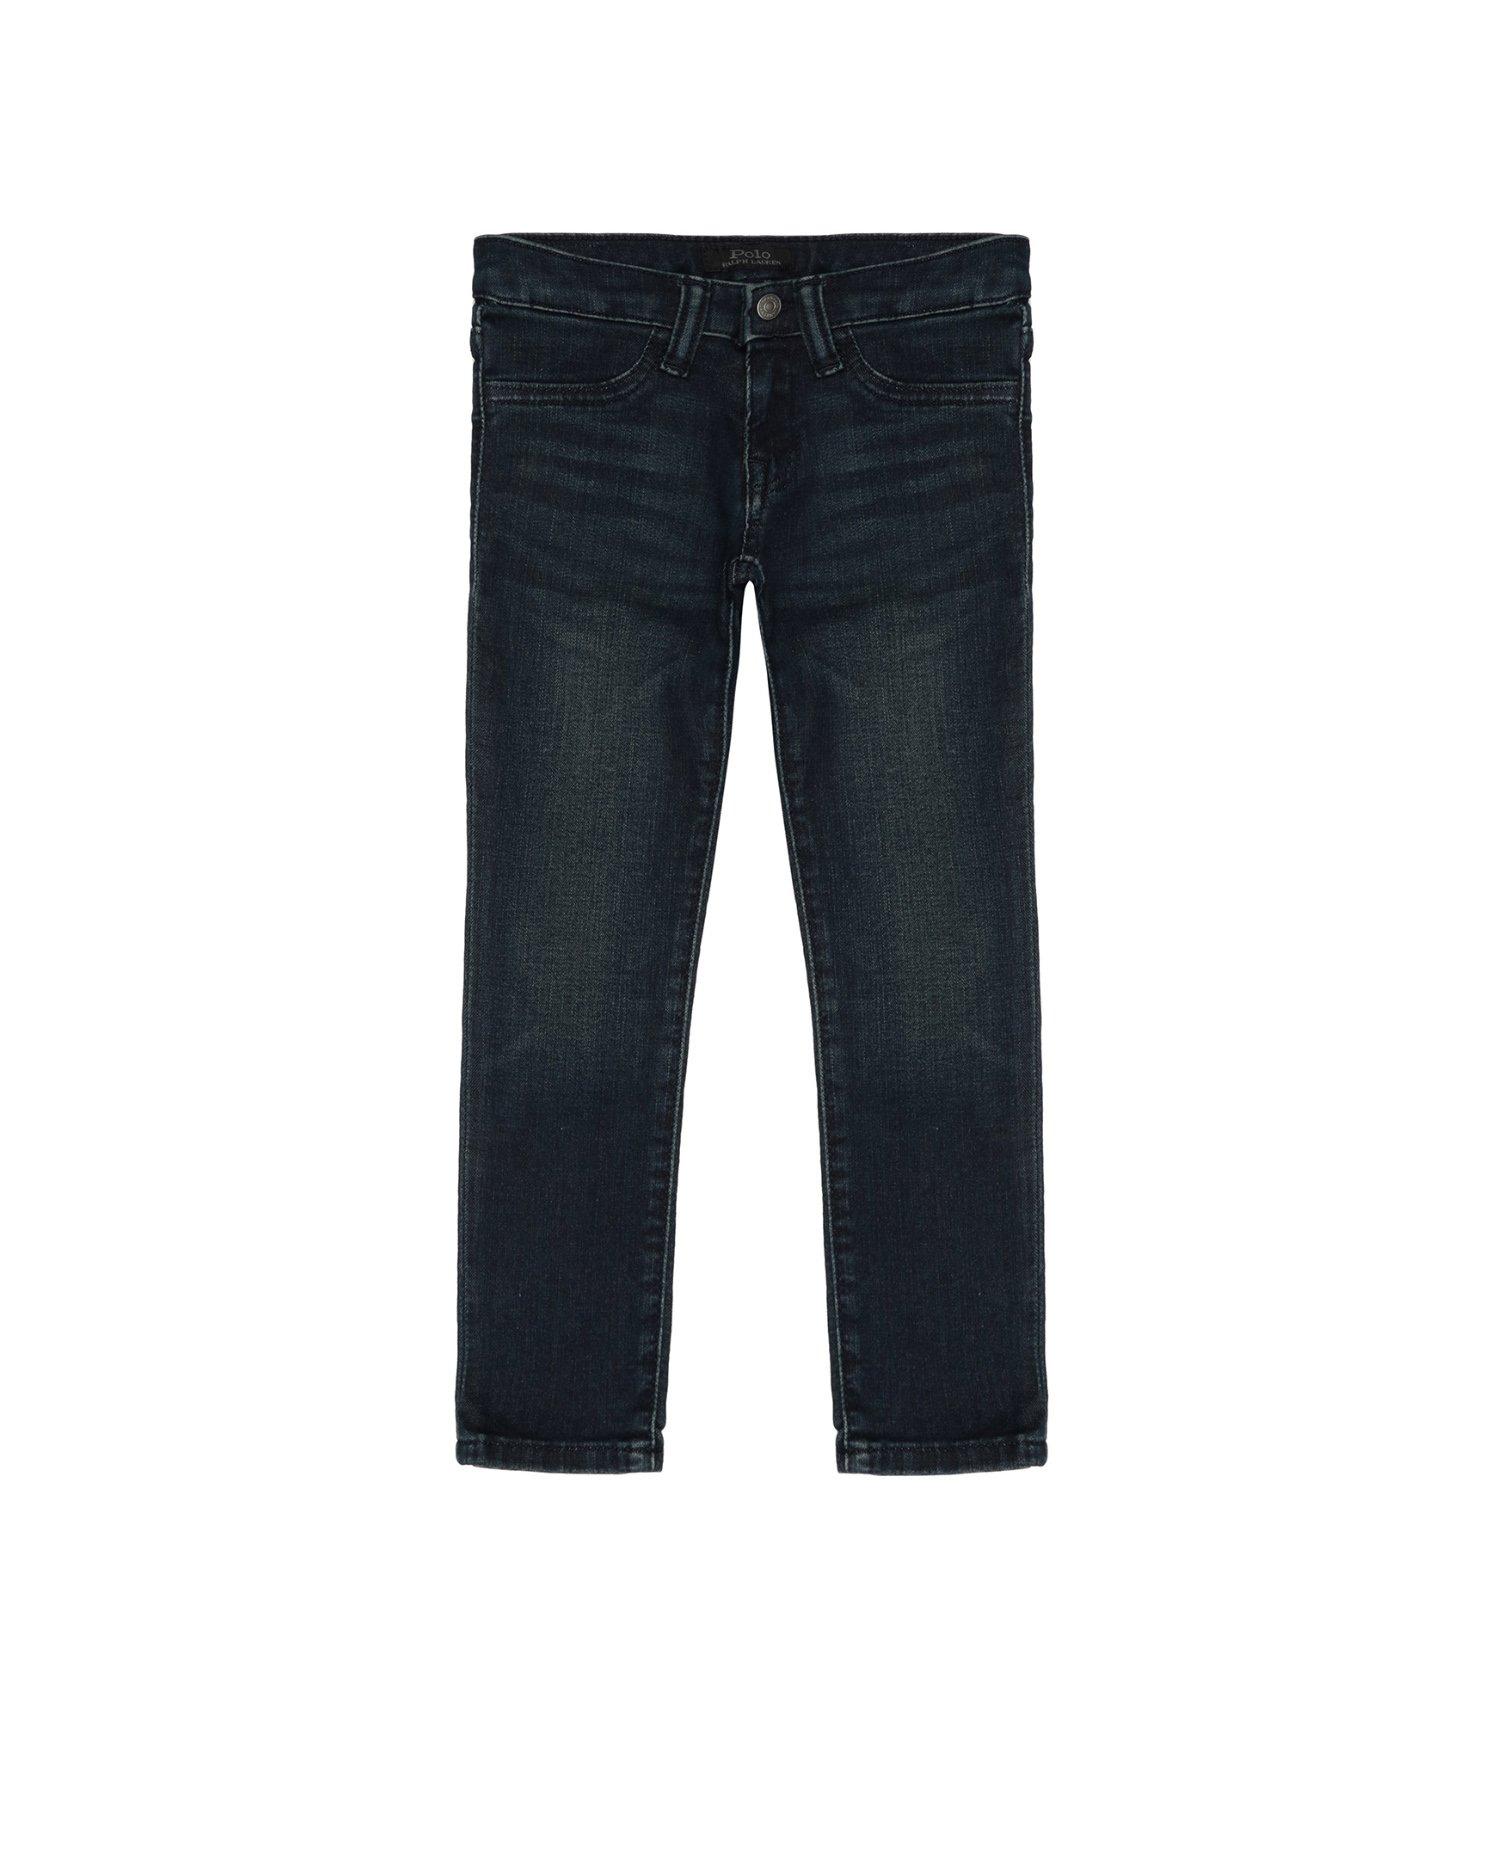 Дитячі сині джинси The Aubrie Legging 1